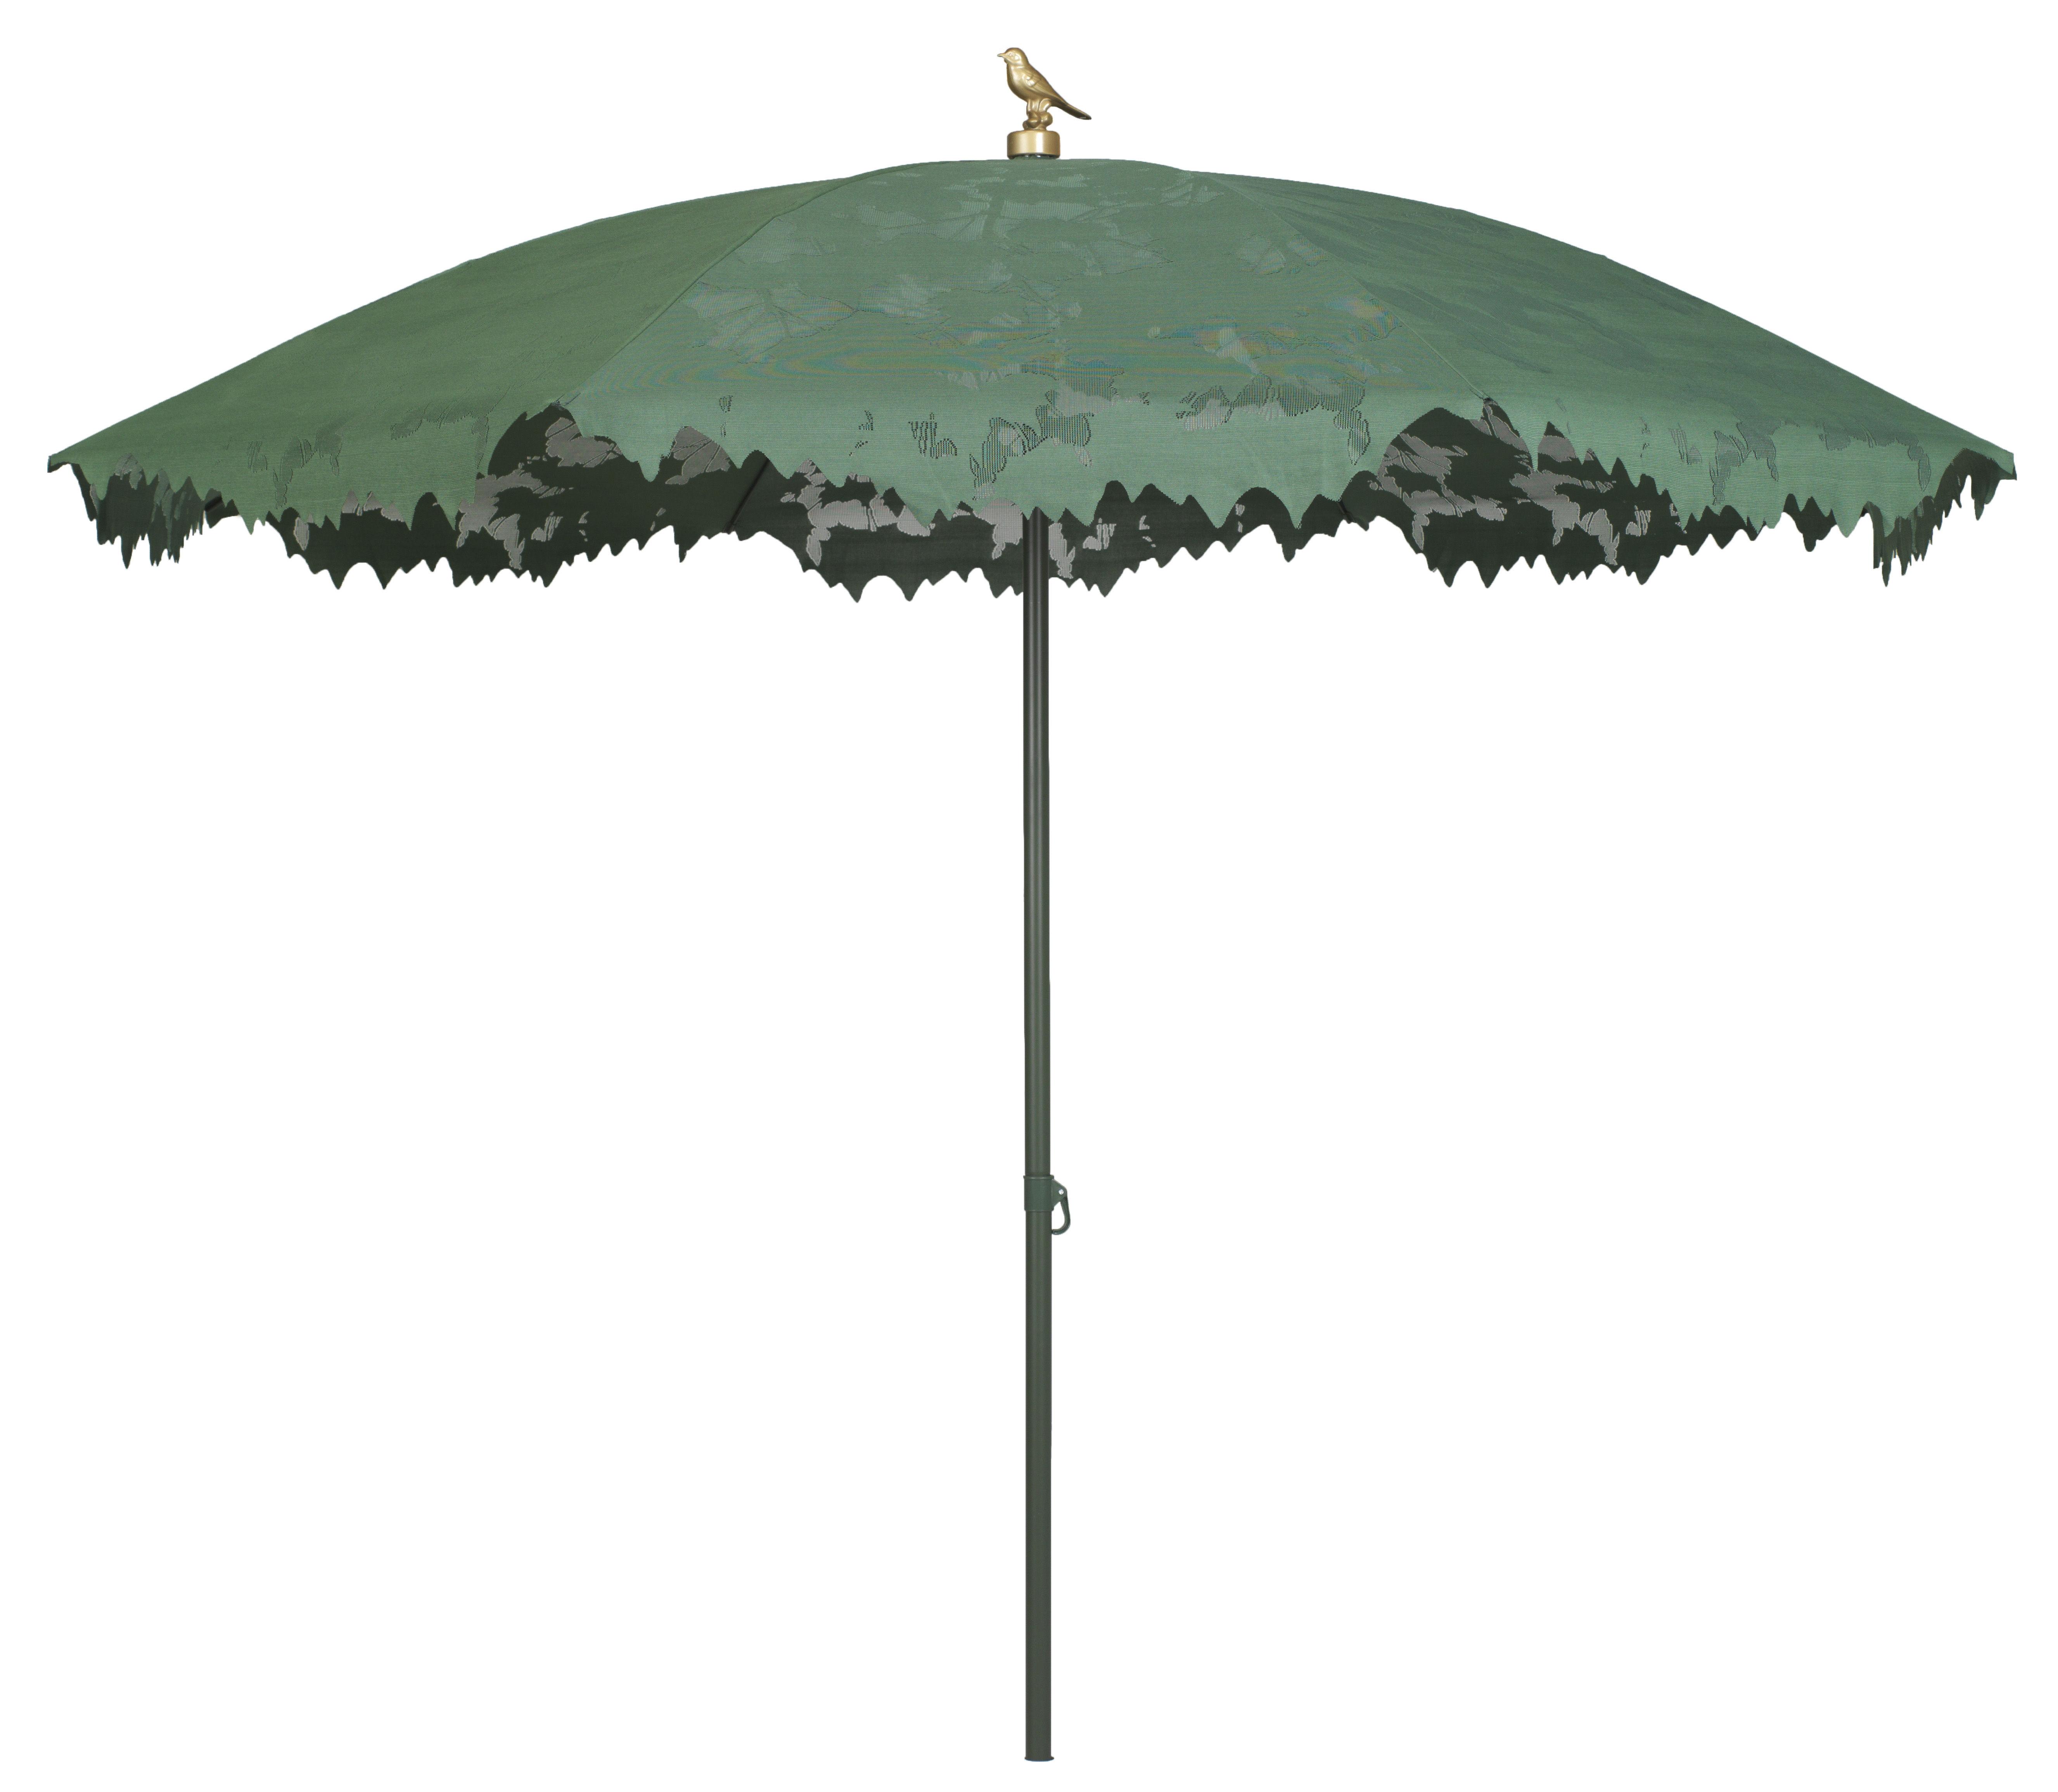 parasol shadylace 245 cm parasol vert m t alu oiseau. Black Bedroom Furniture Sets. Home Design Ideas